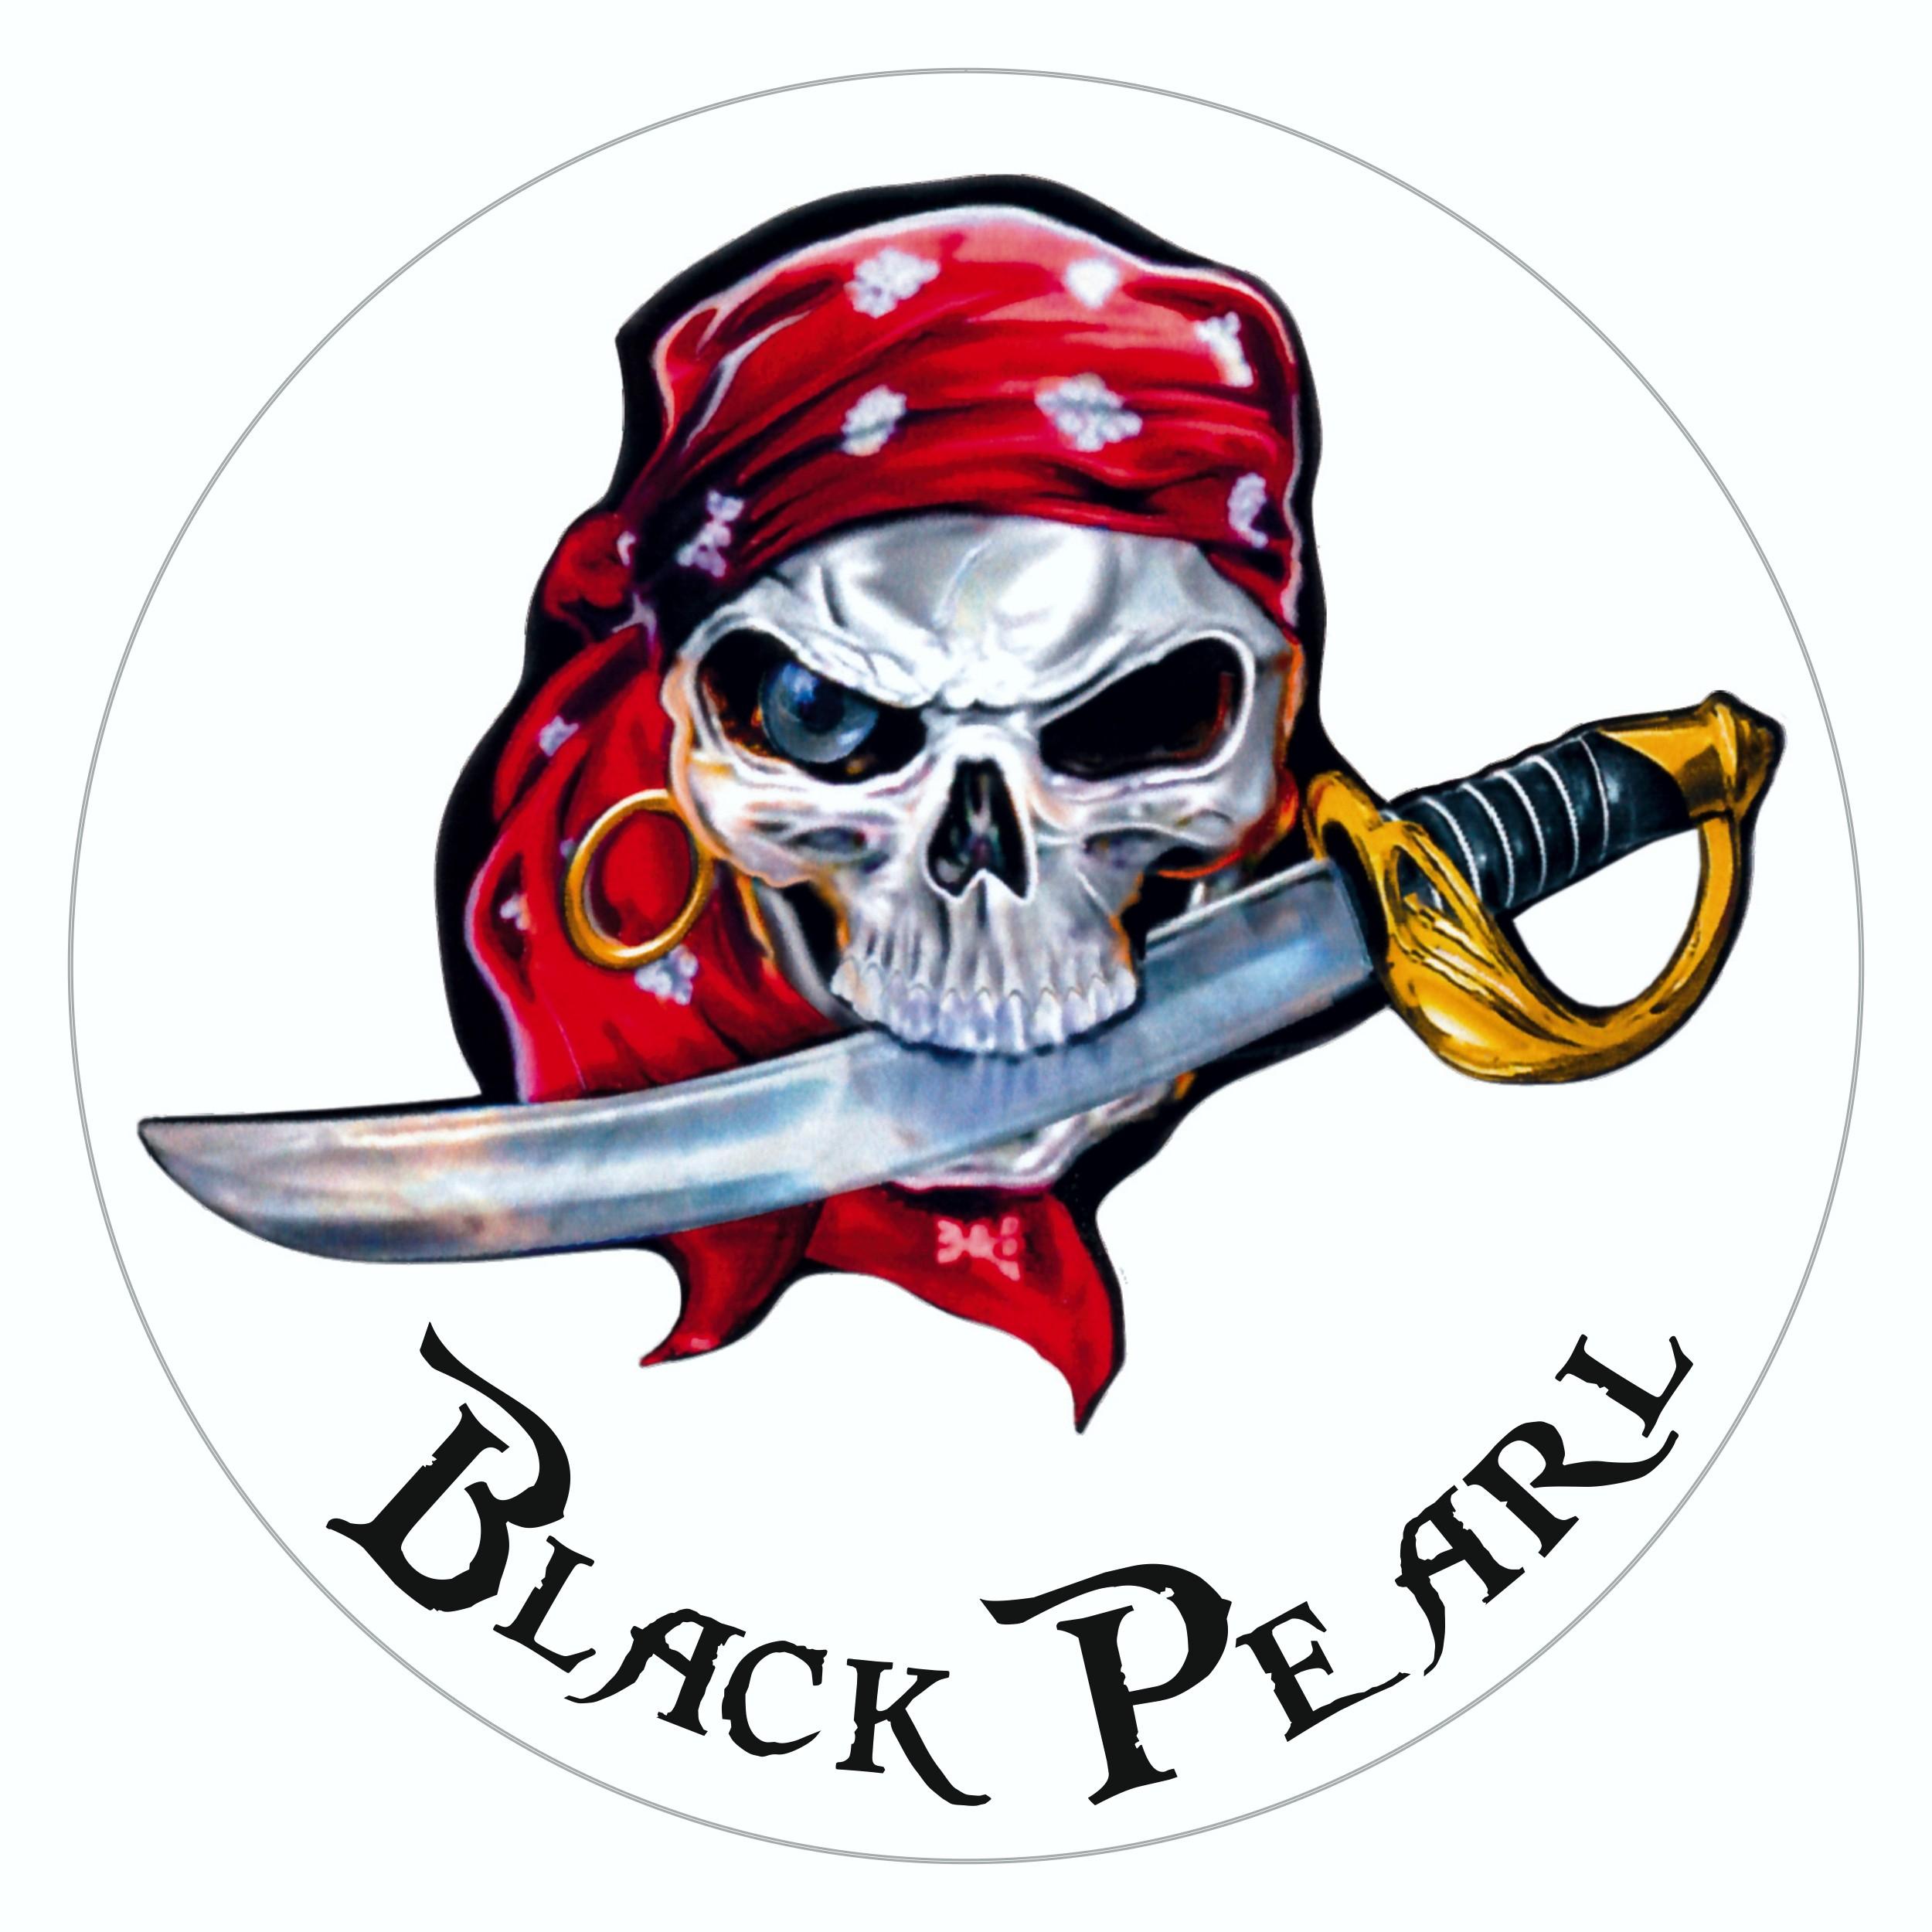 Autocollant Black Pearl transparent Ø 120 mm – Bild 1